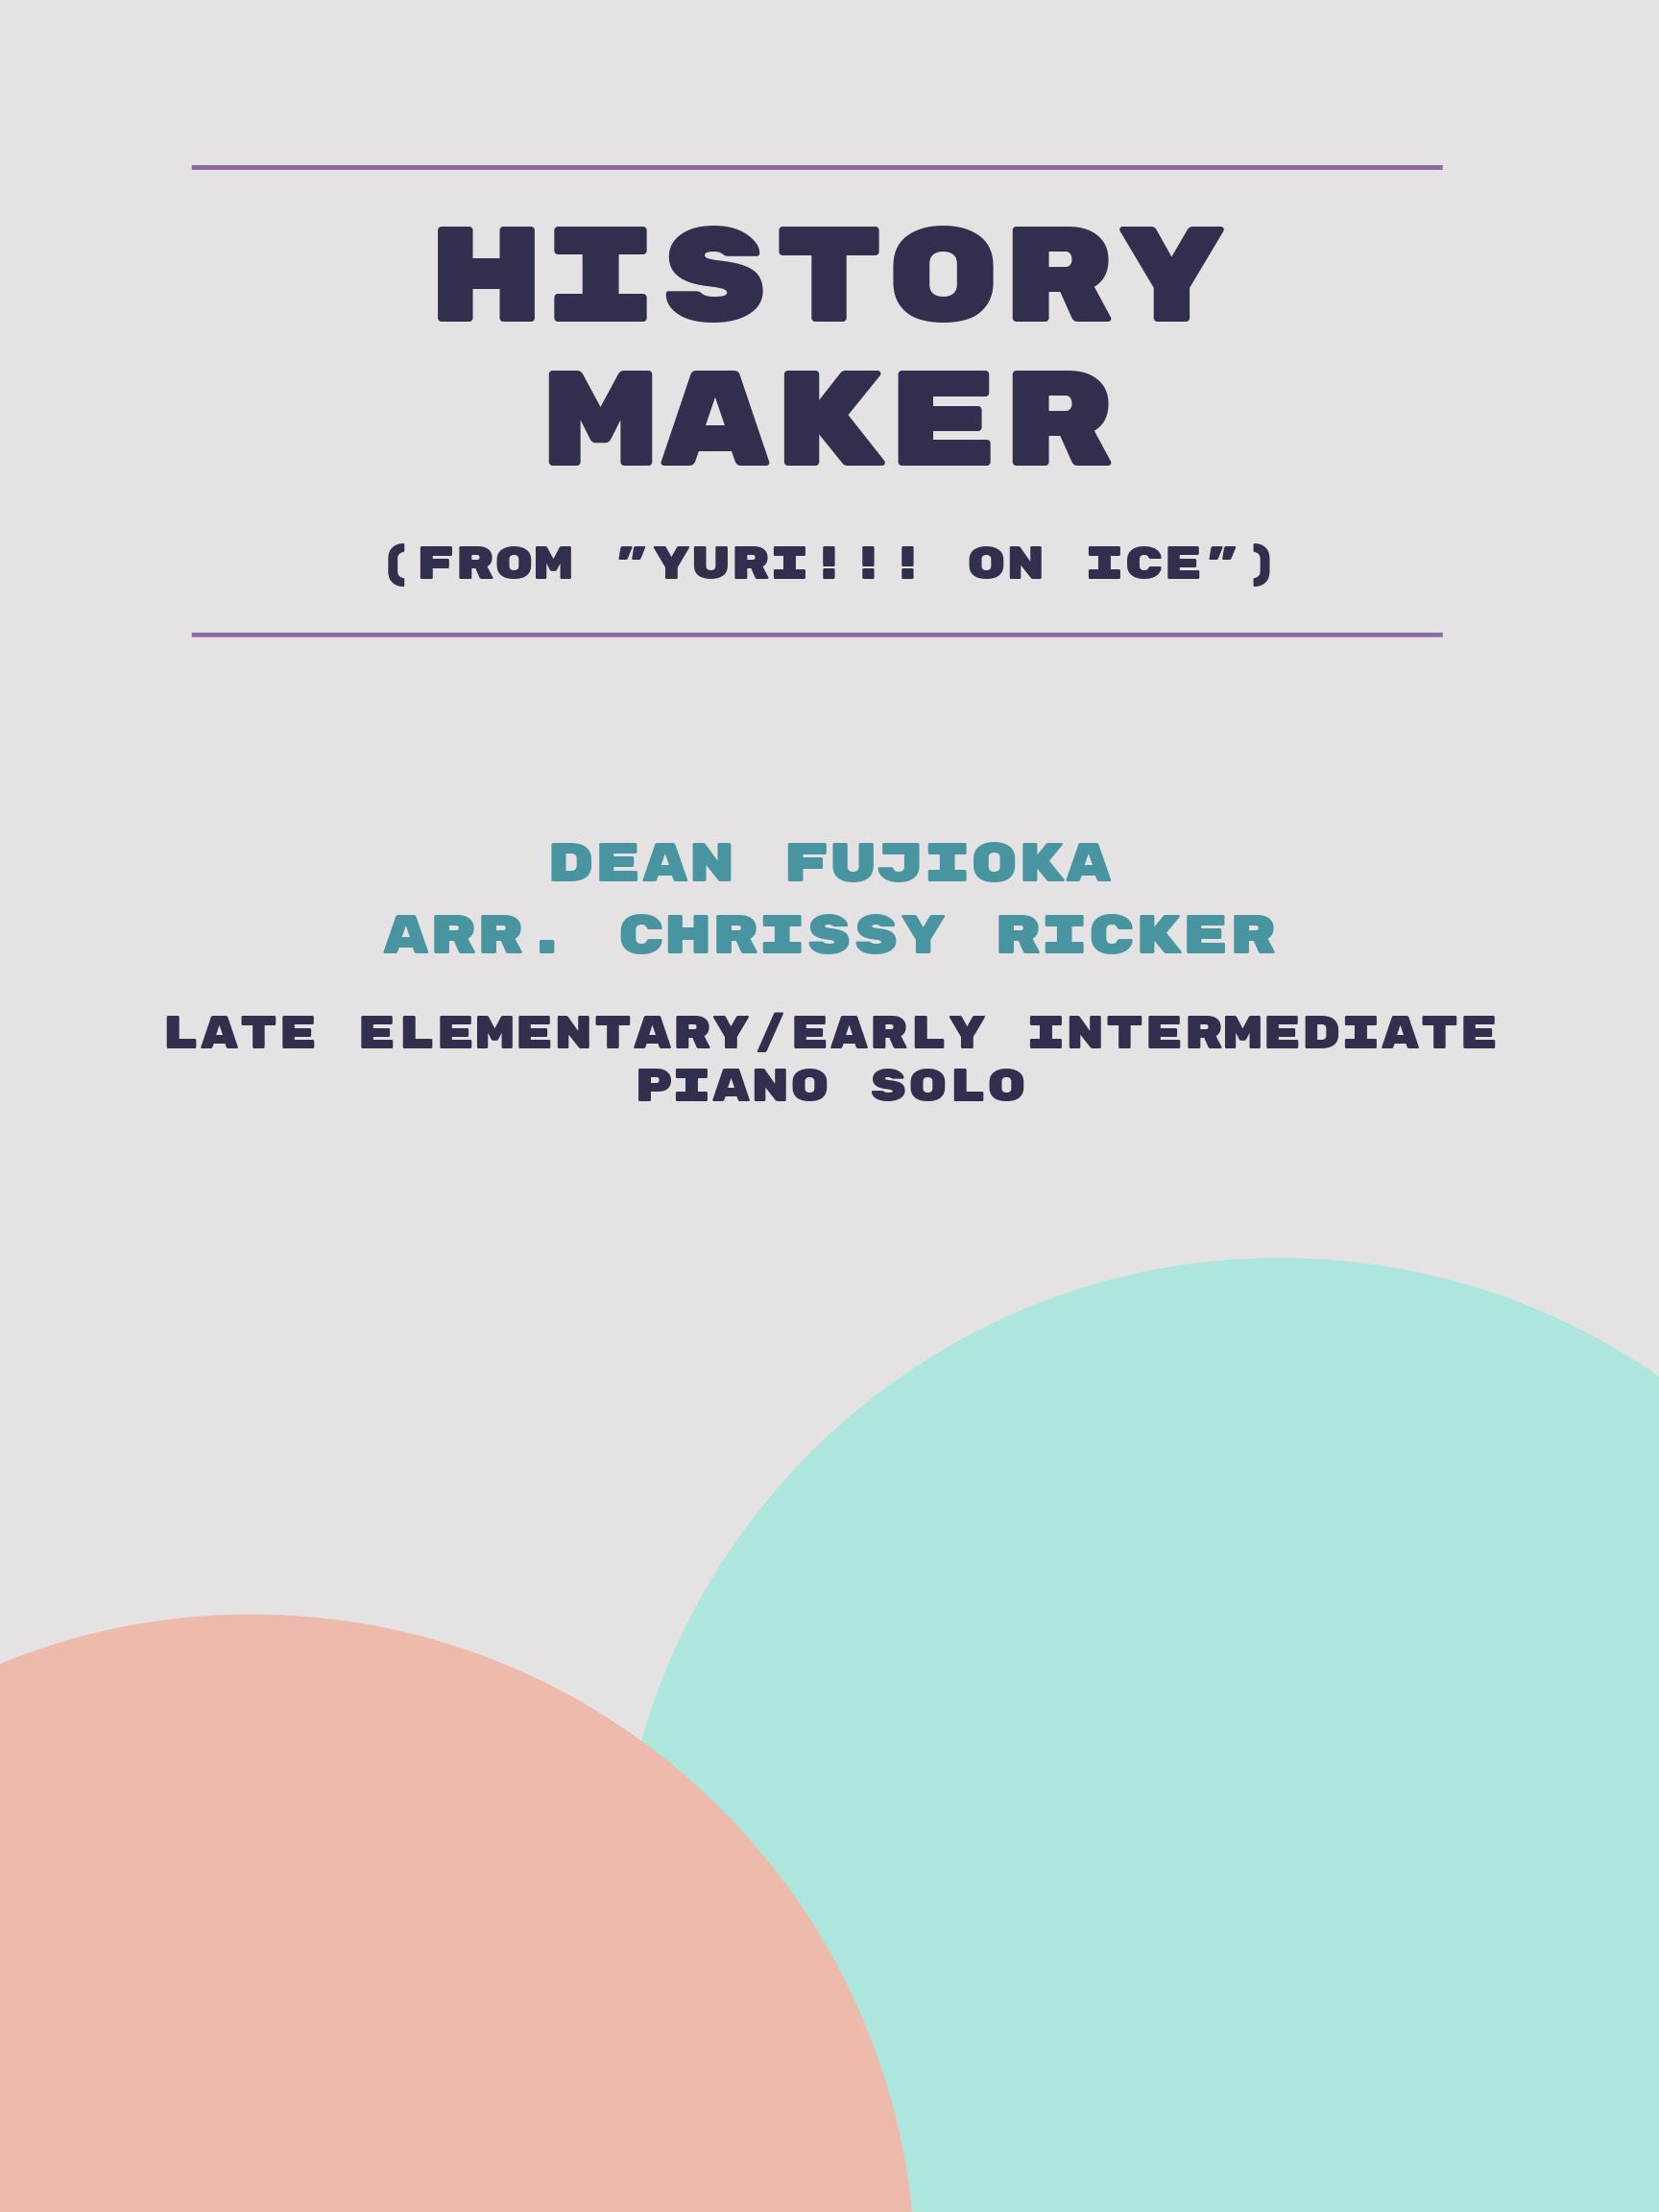 History Maker by Dean Fujioka